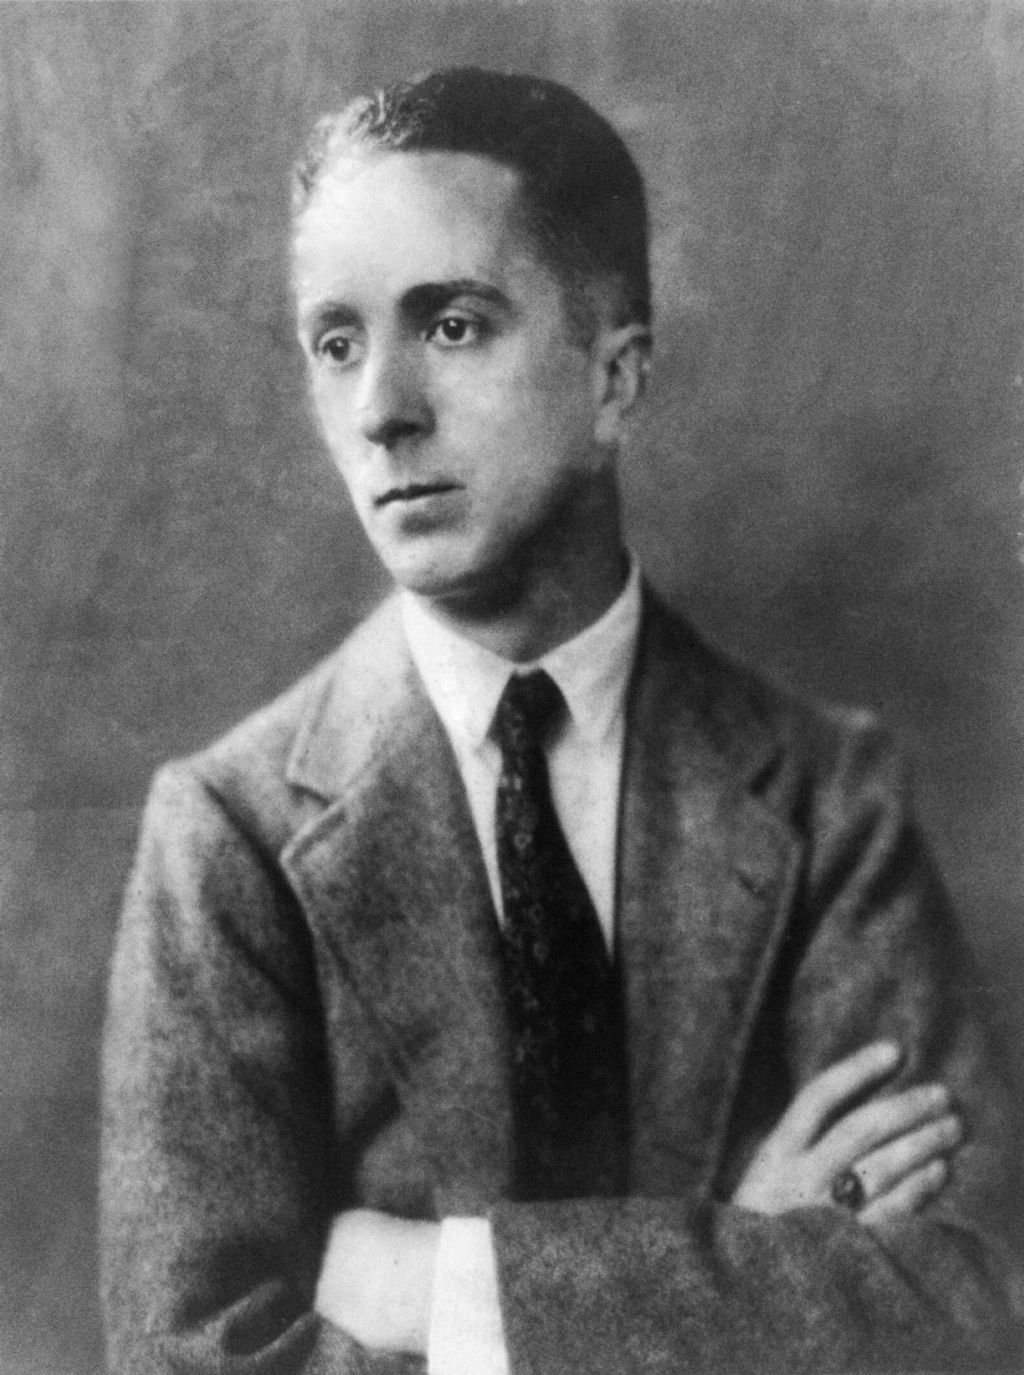 Norman Rockwell, circa 1921 Courtesy, Library of Congress